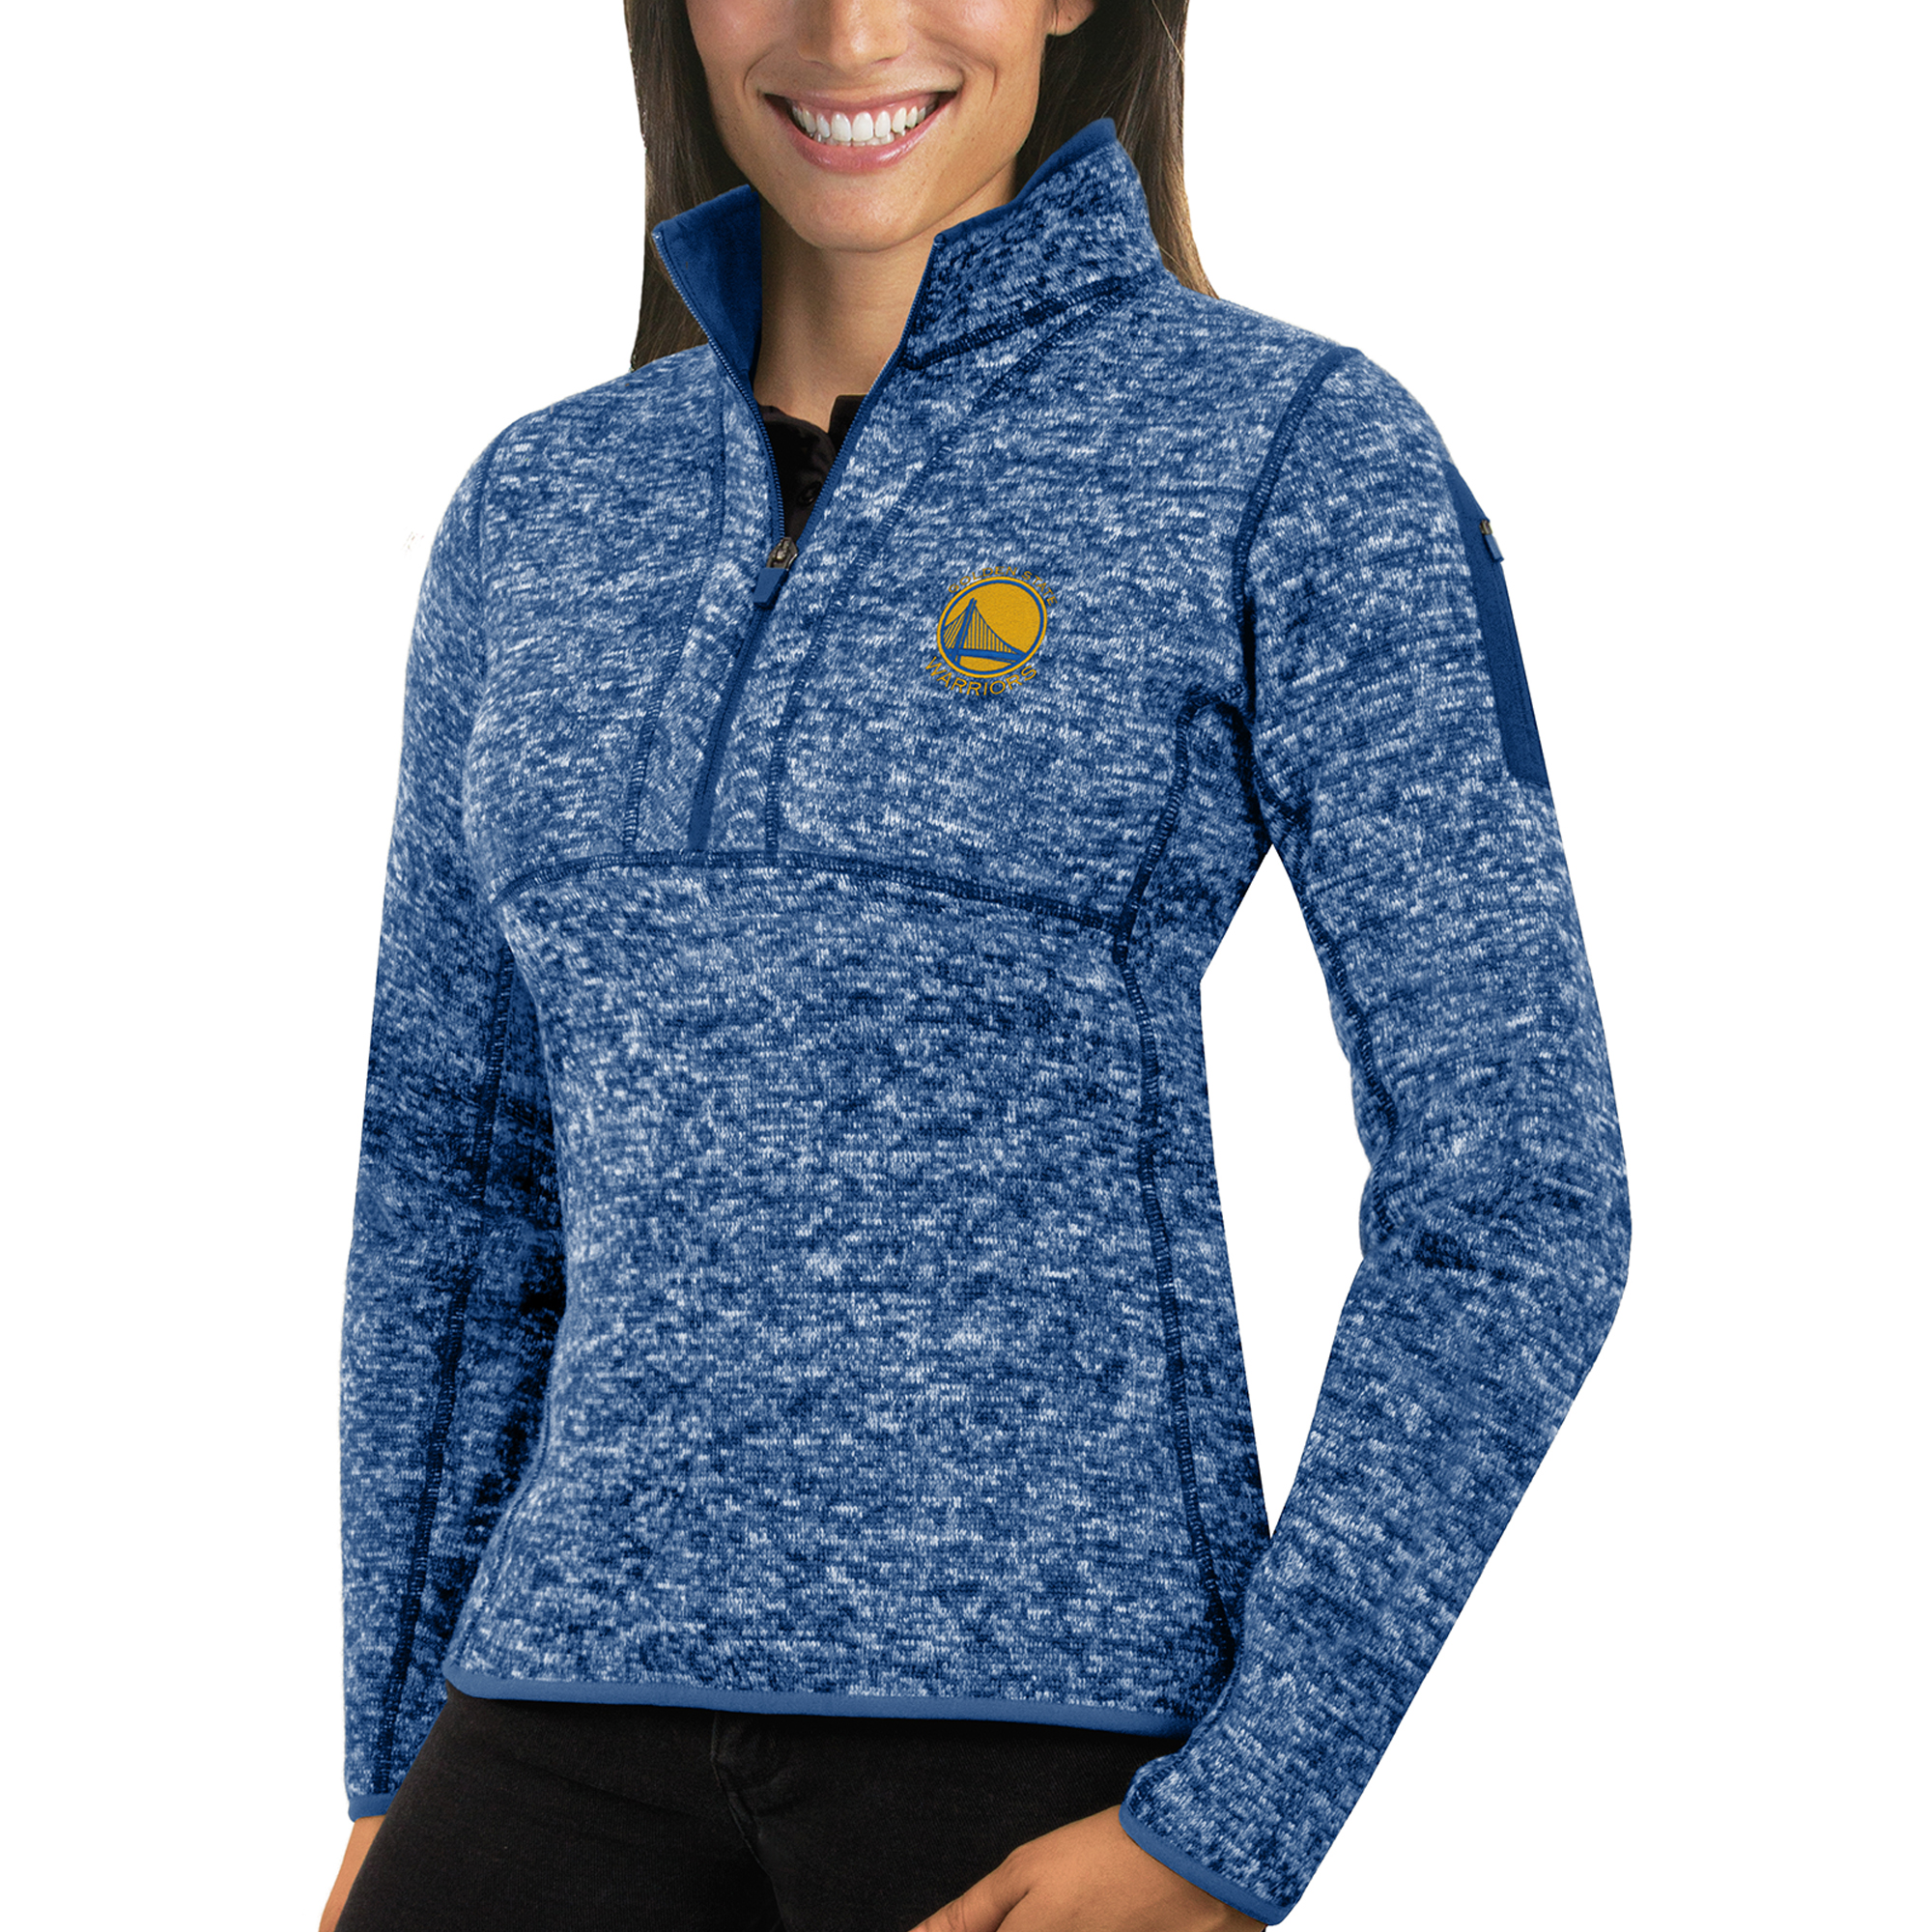 Golden State Warriors Antigua Women's Fortune Half-Zip Pullover Jacket - Heather Royal